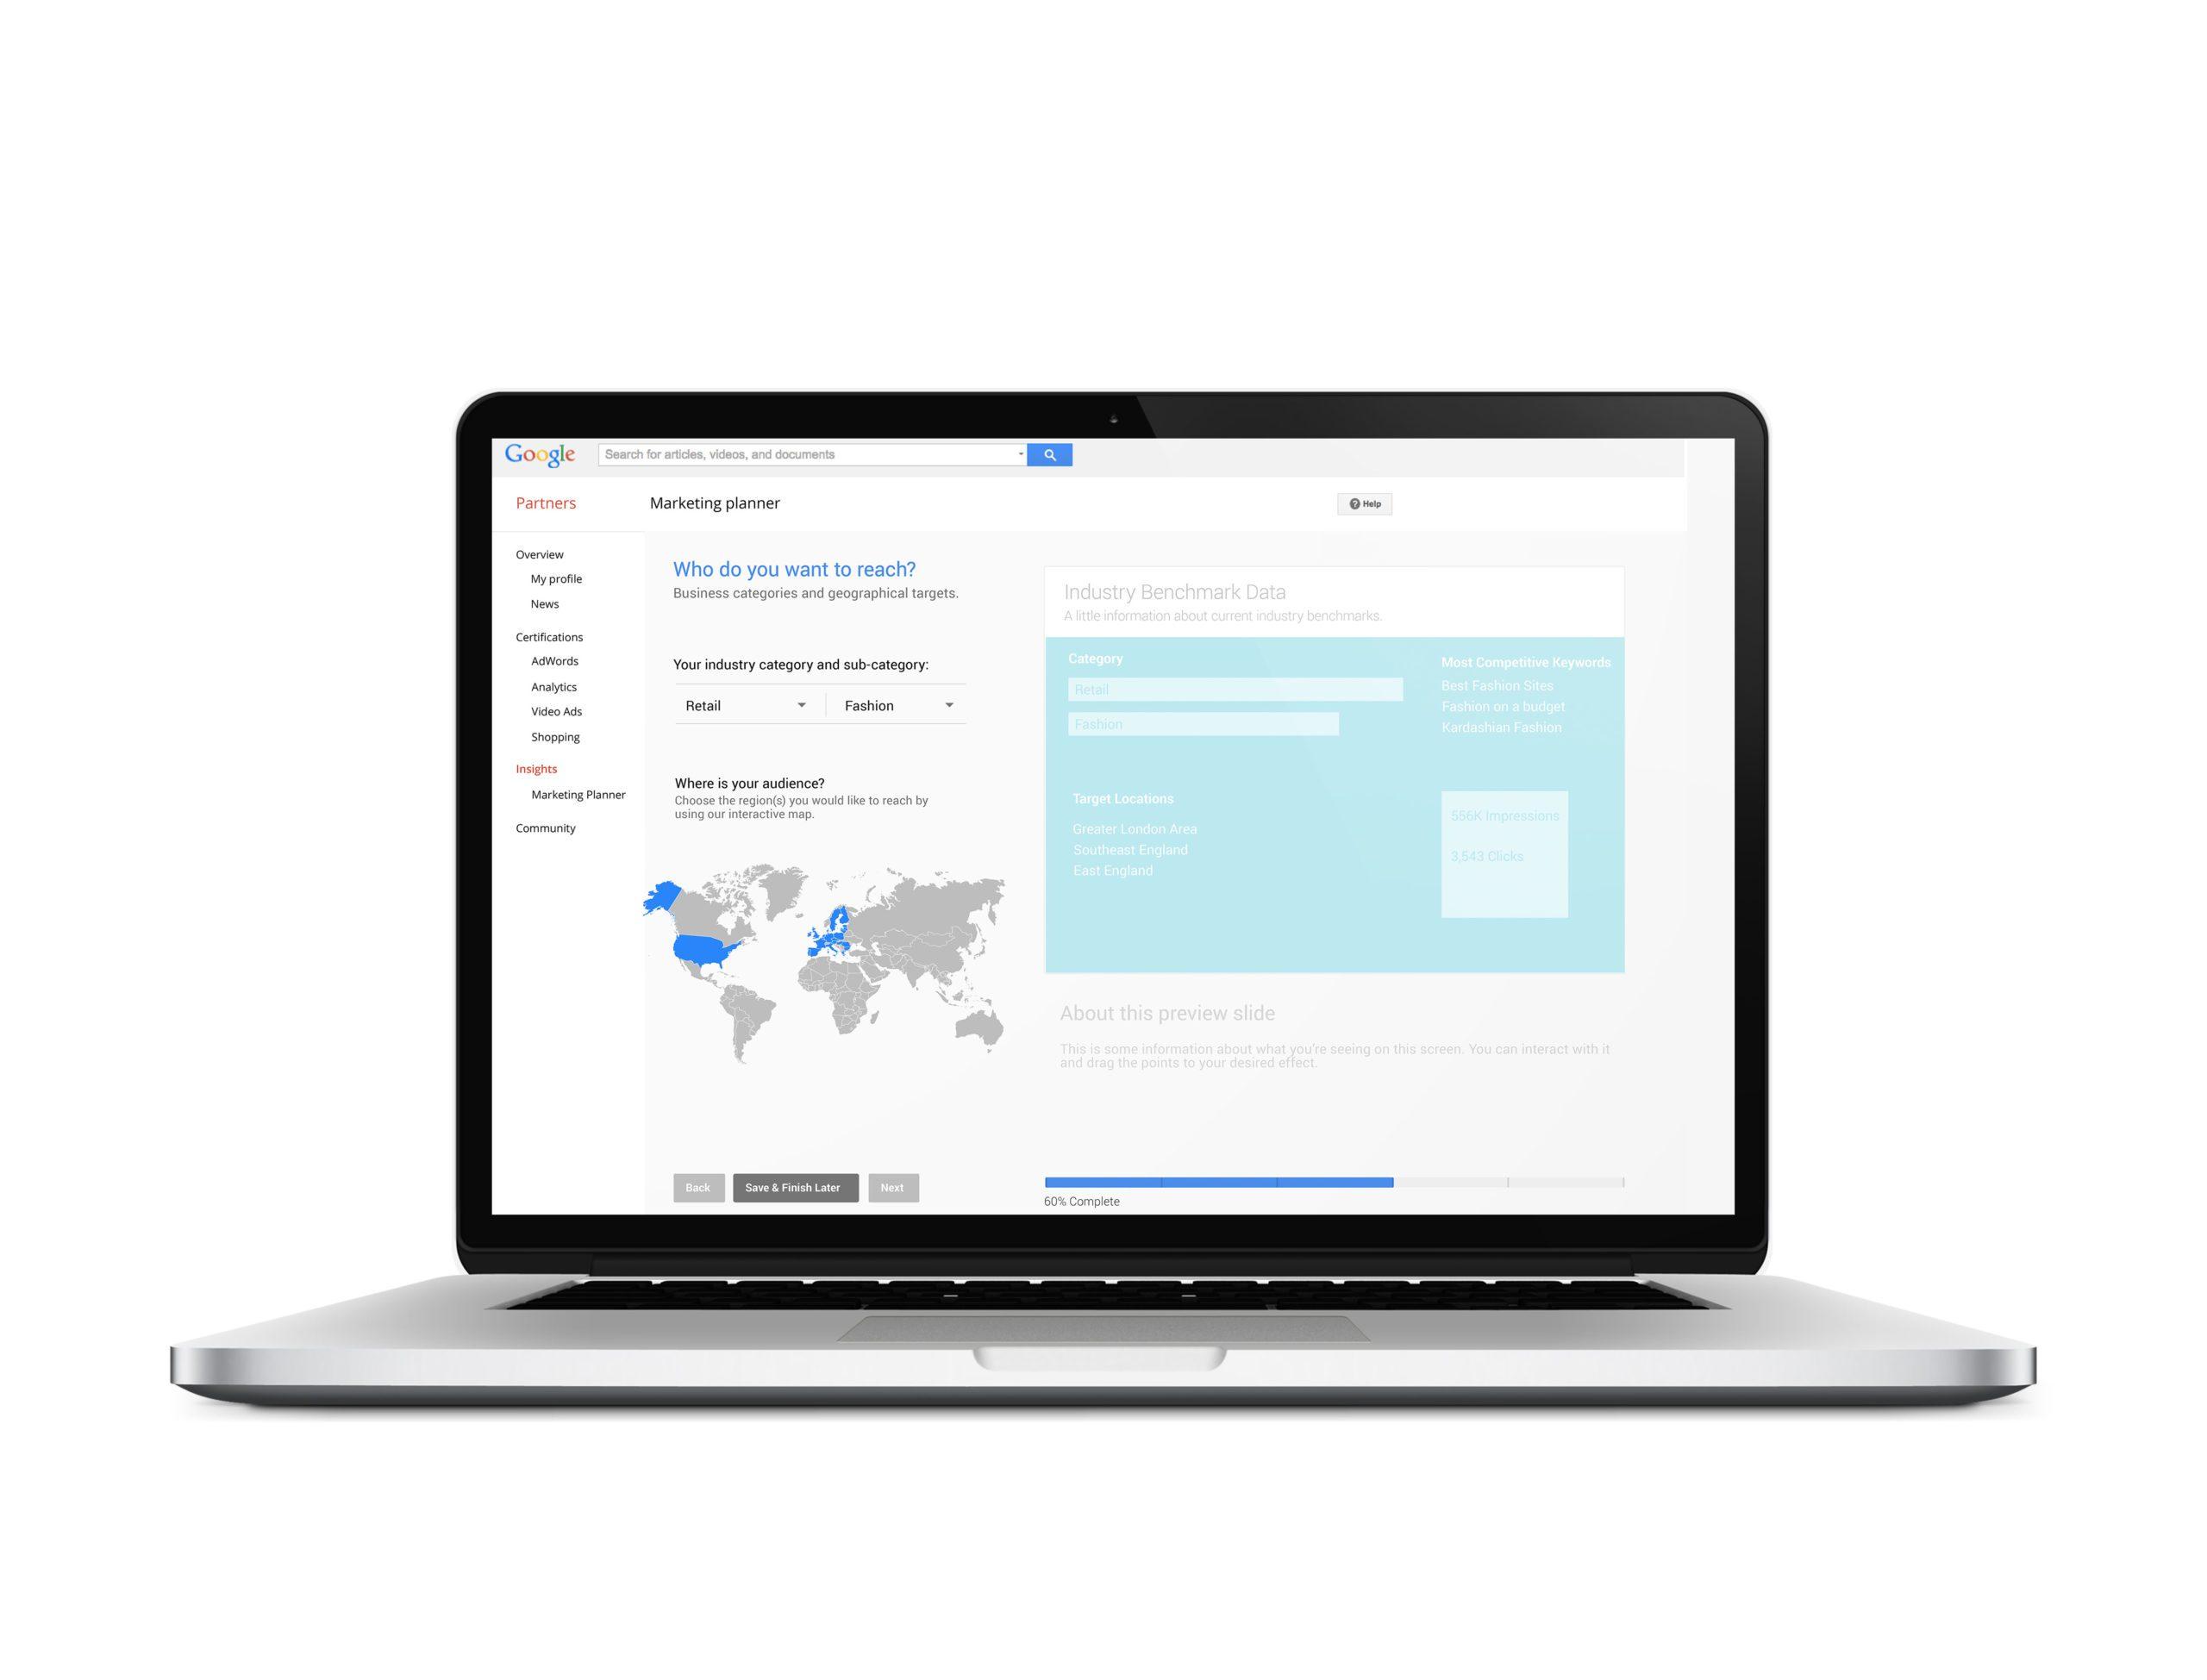 google-marketing-planner-macbook-screen4